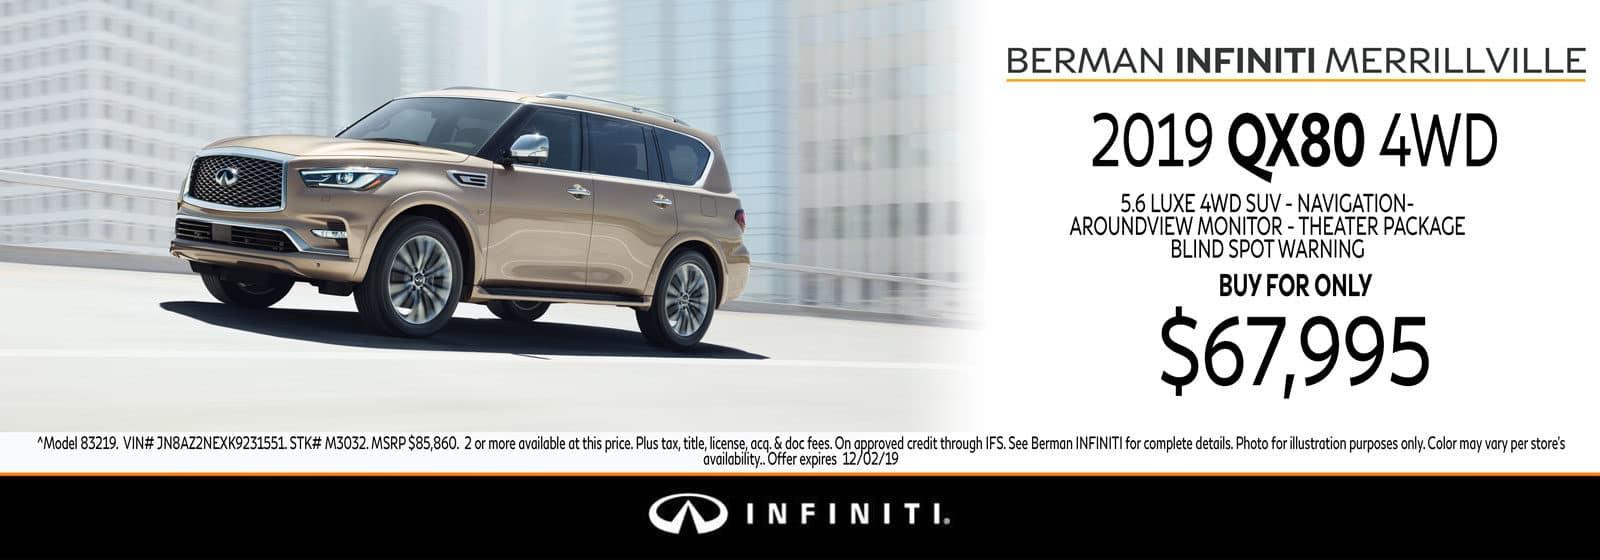 New 2019 INFINITI QX80 November Offer at Berman INFINITI of Merrillville!